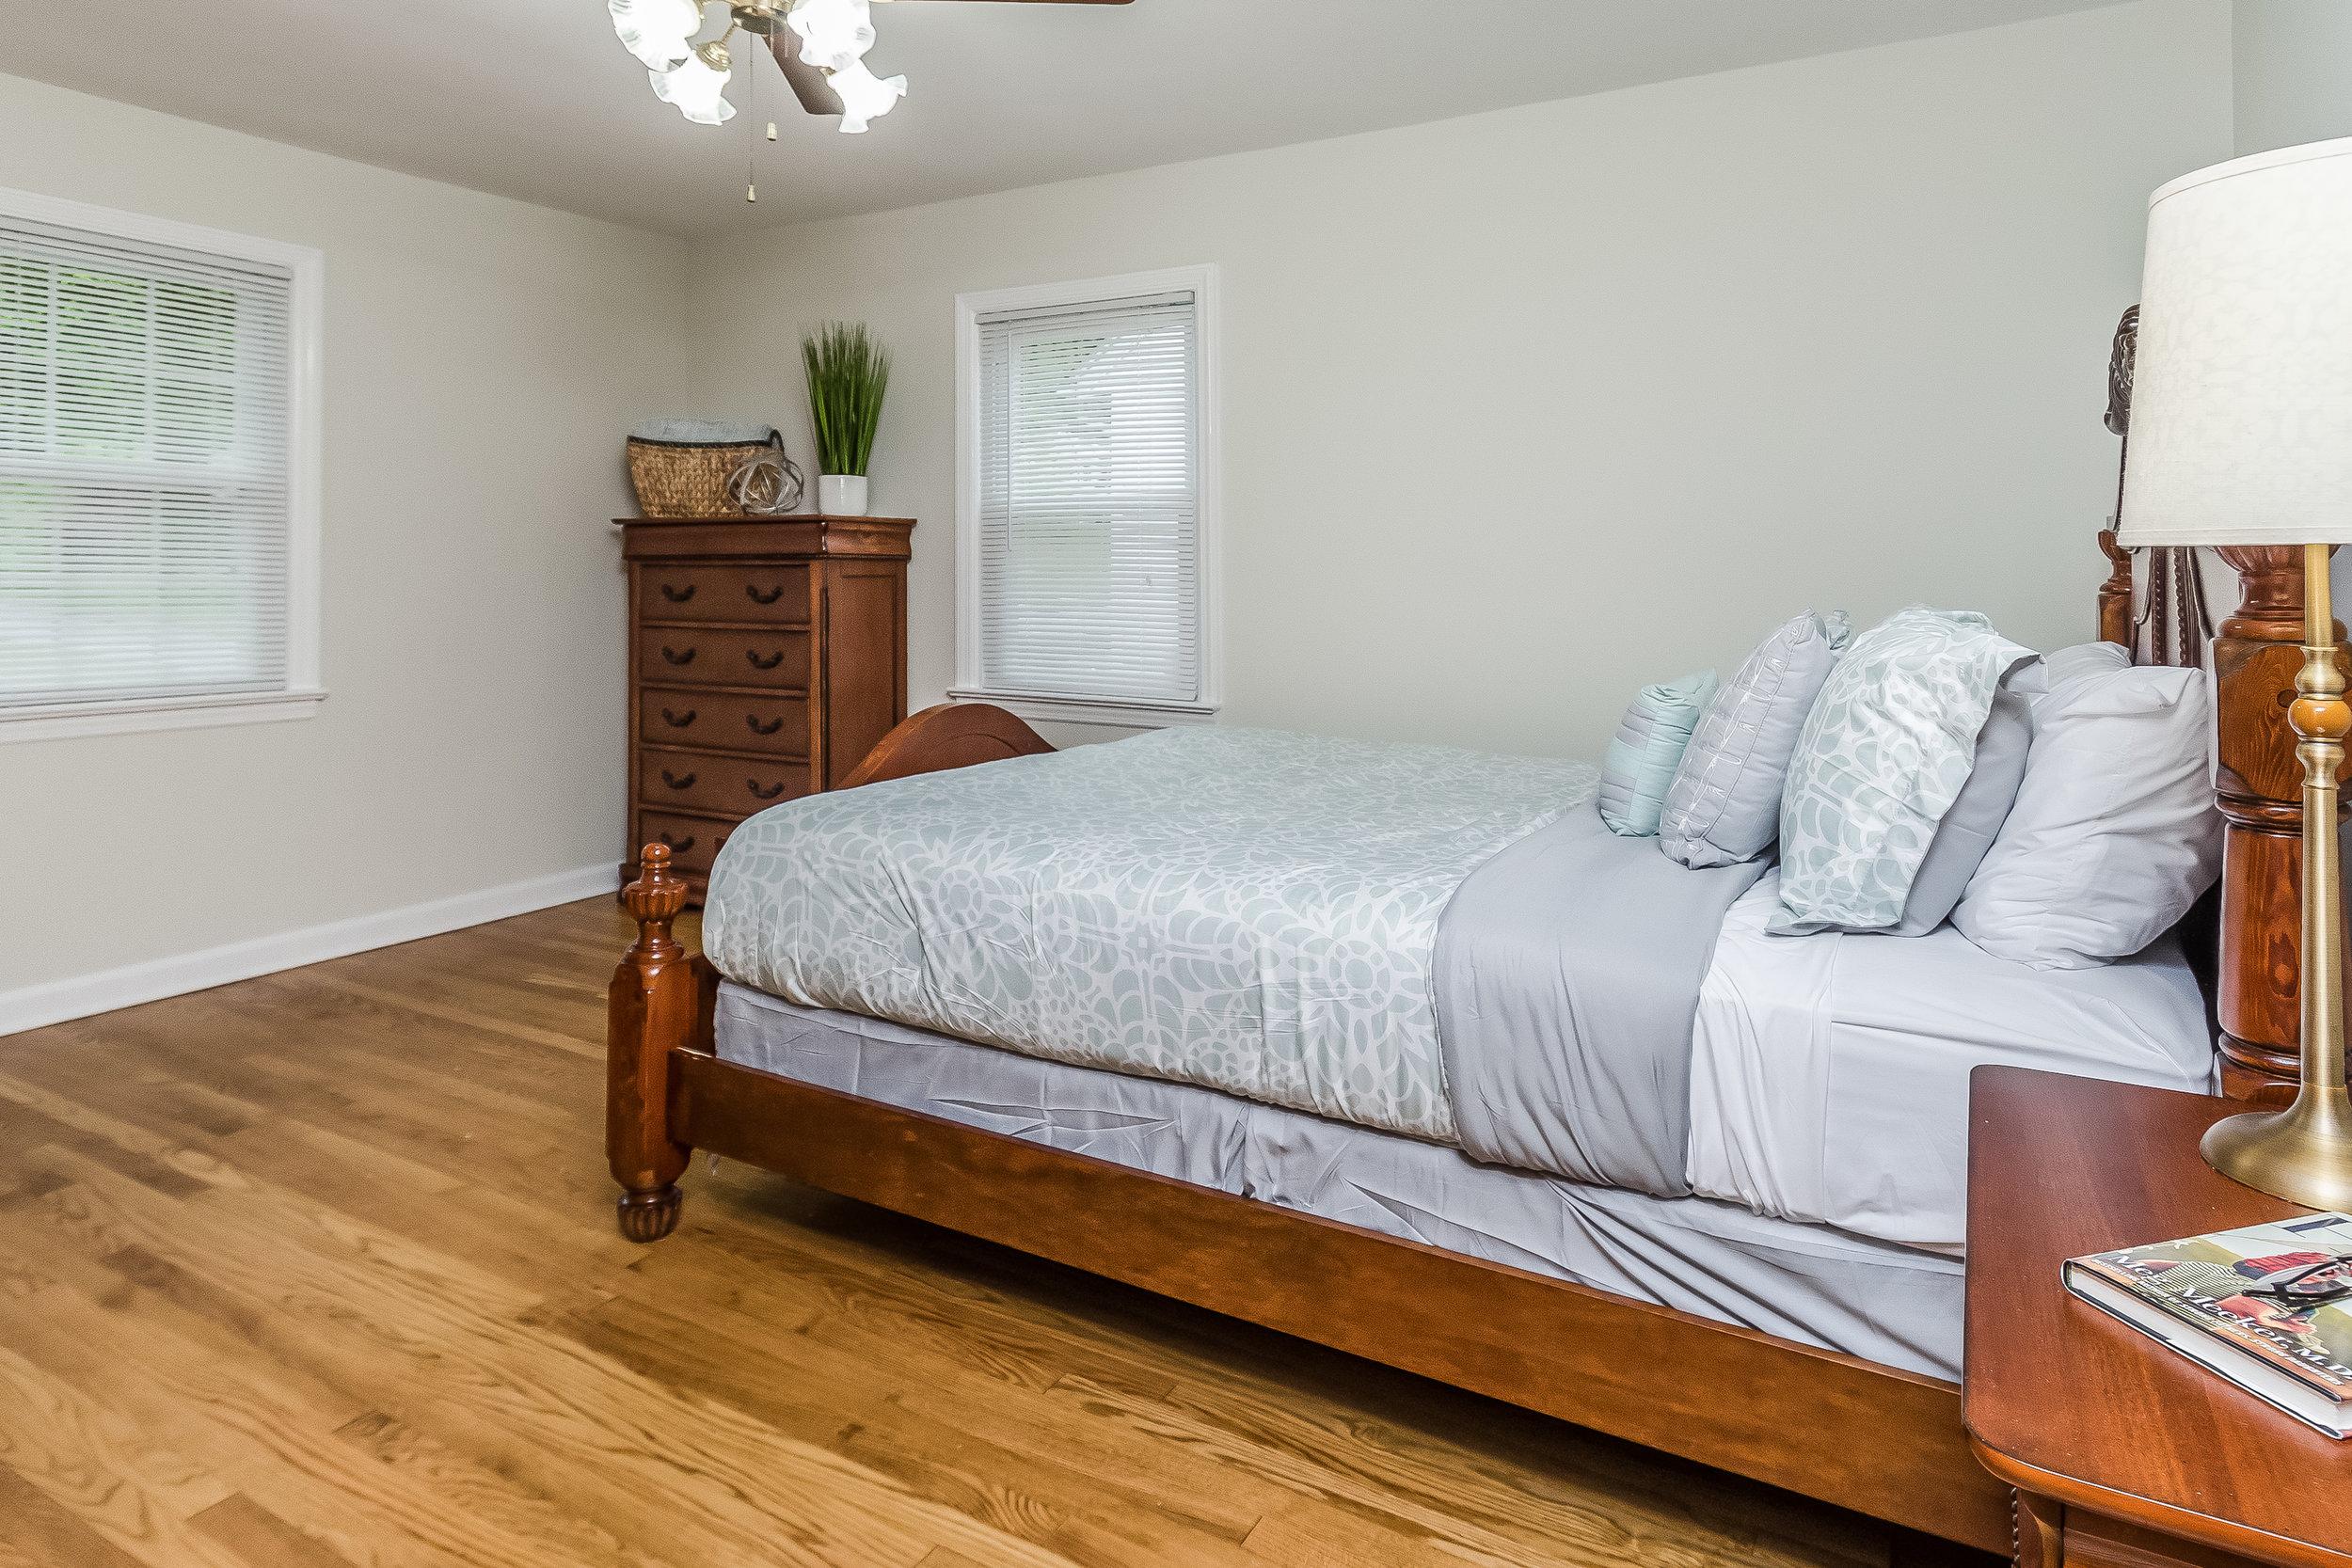 019-photo-master-bedroom-5786544.jpg